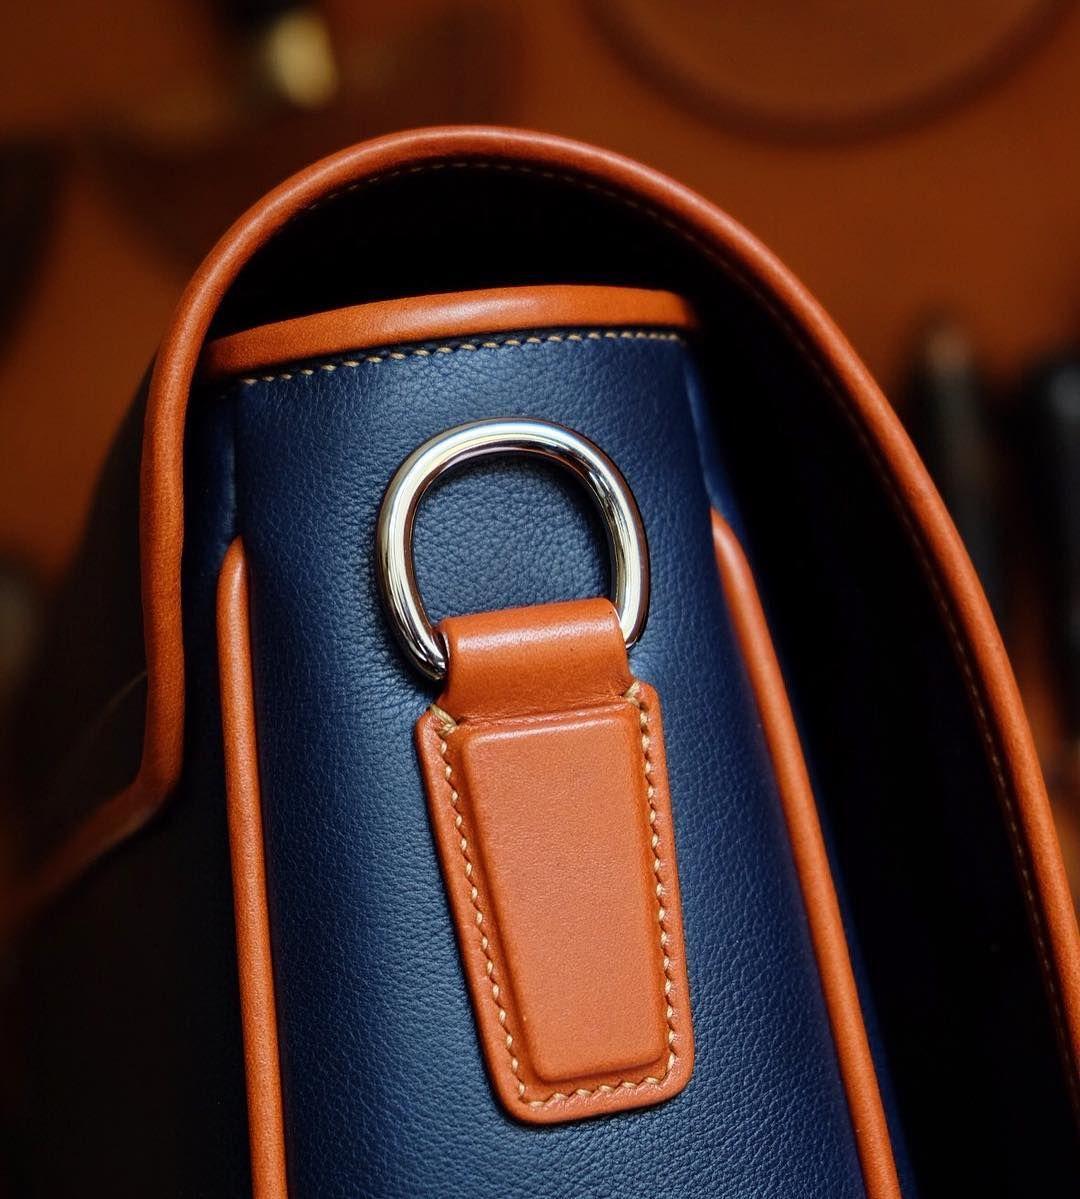 Men's messenger bag details by Ondrej Sima